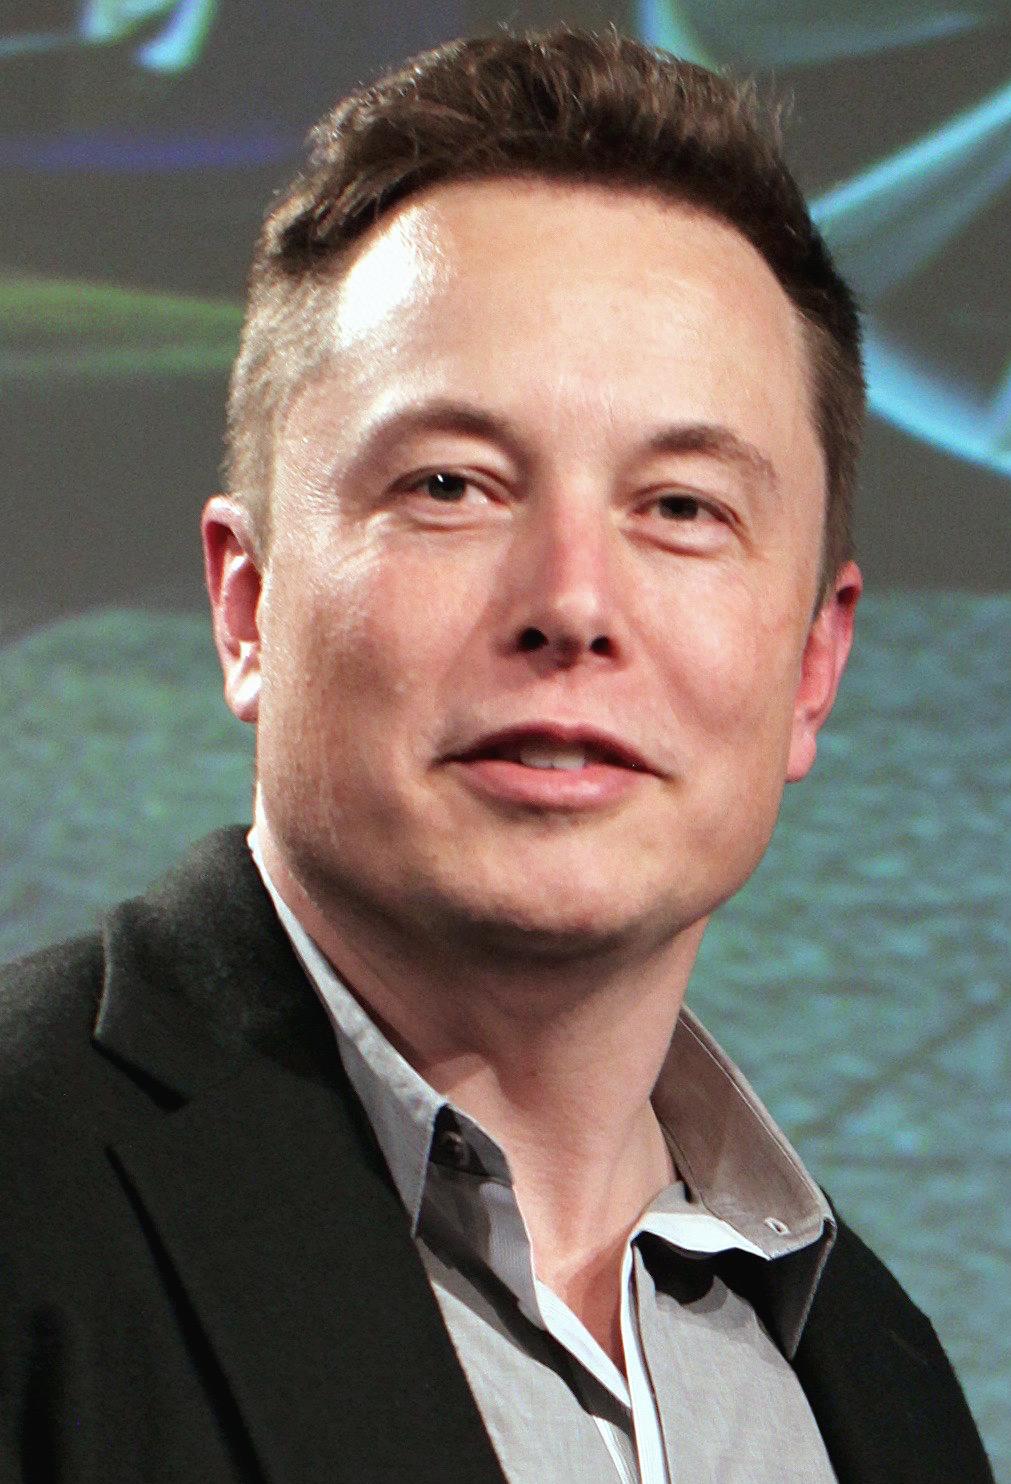 Elon Musk Makes The Case Again For Universal Basic Income The Merkle News